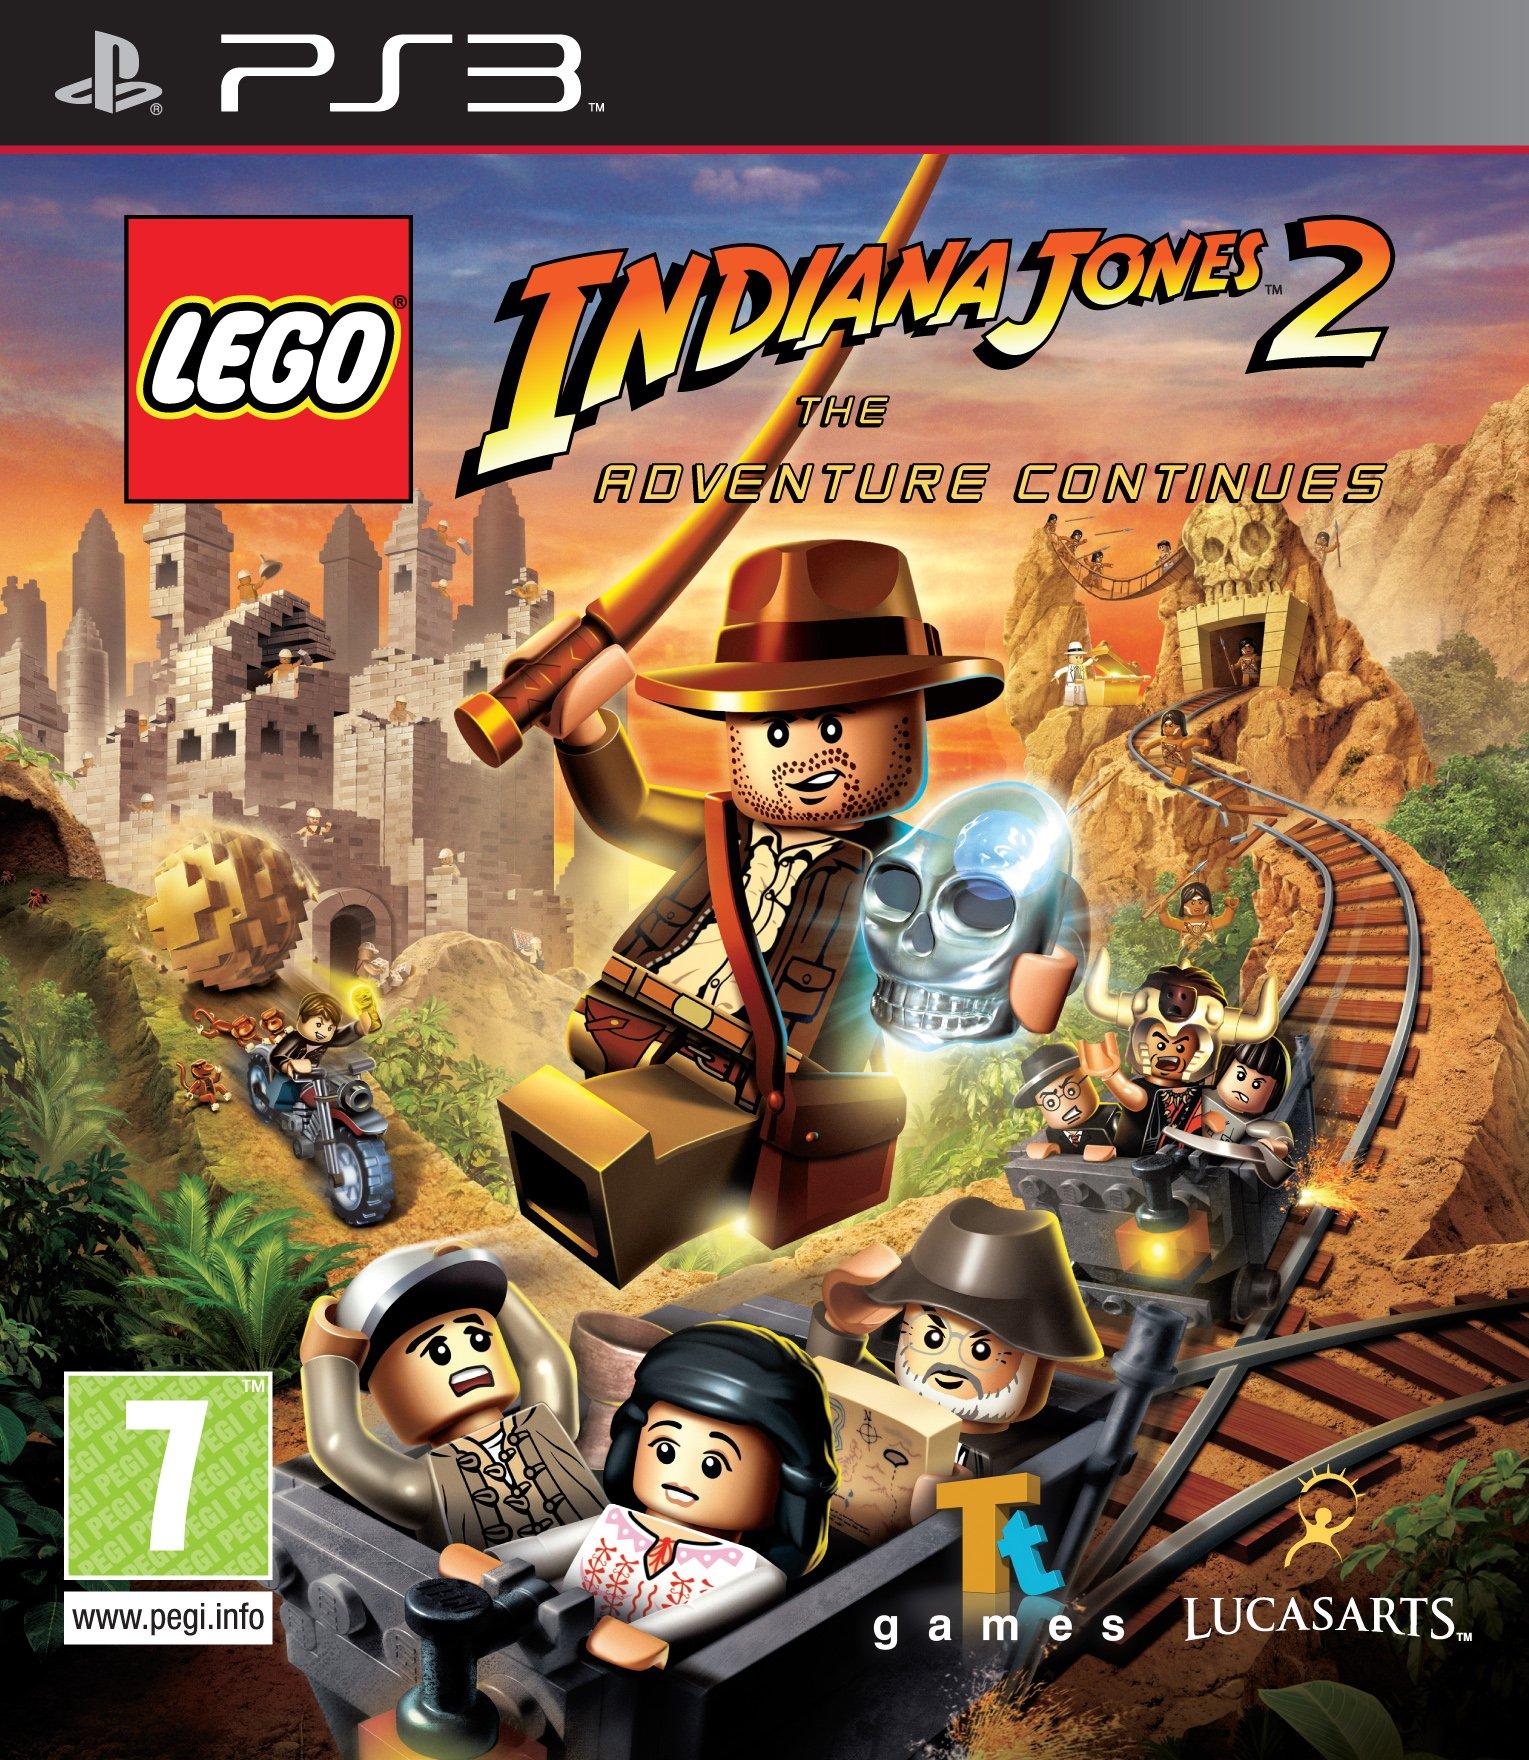 PS3 LEGO Indiana Jones 2 The Adventure Continues